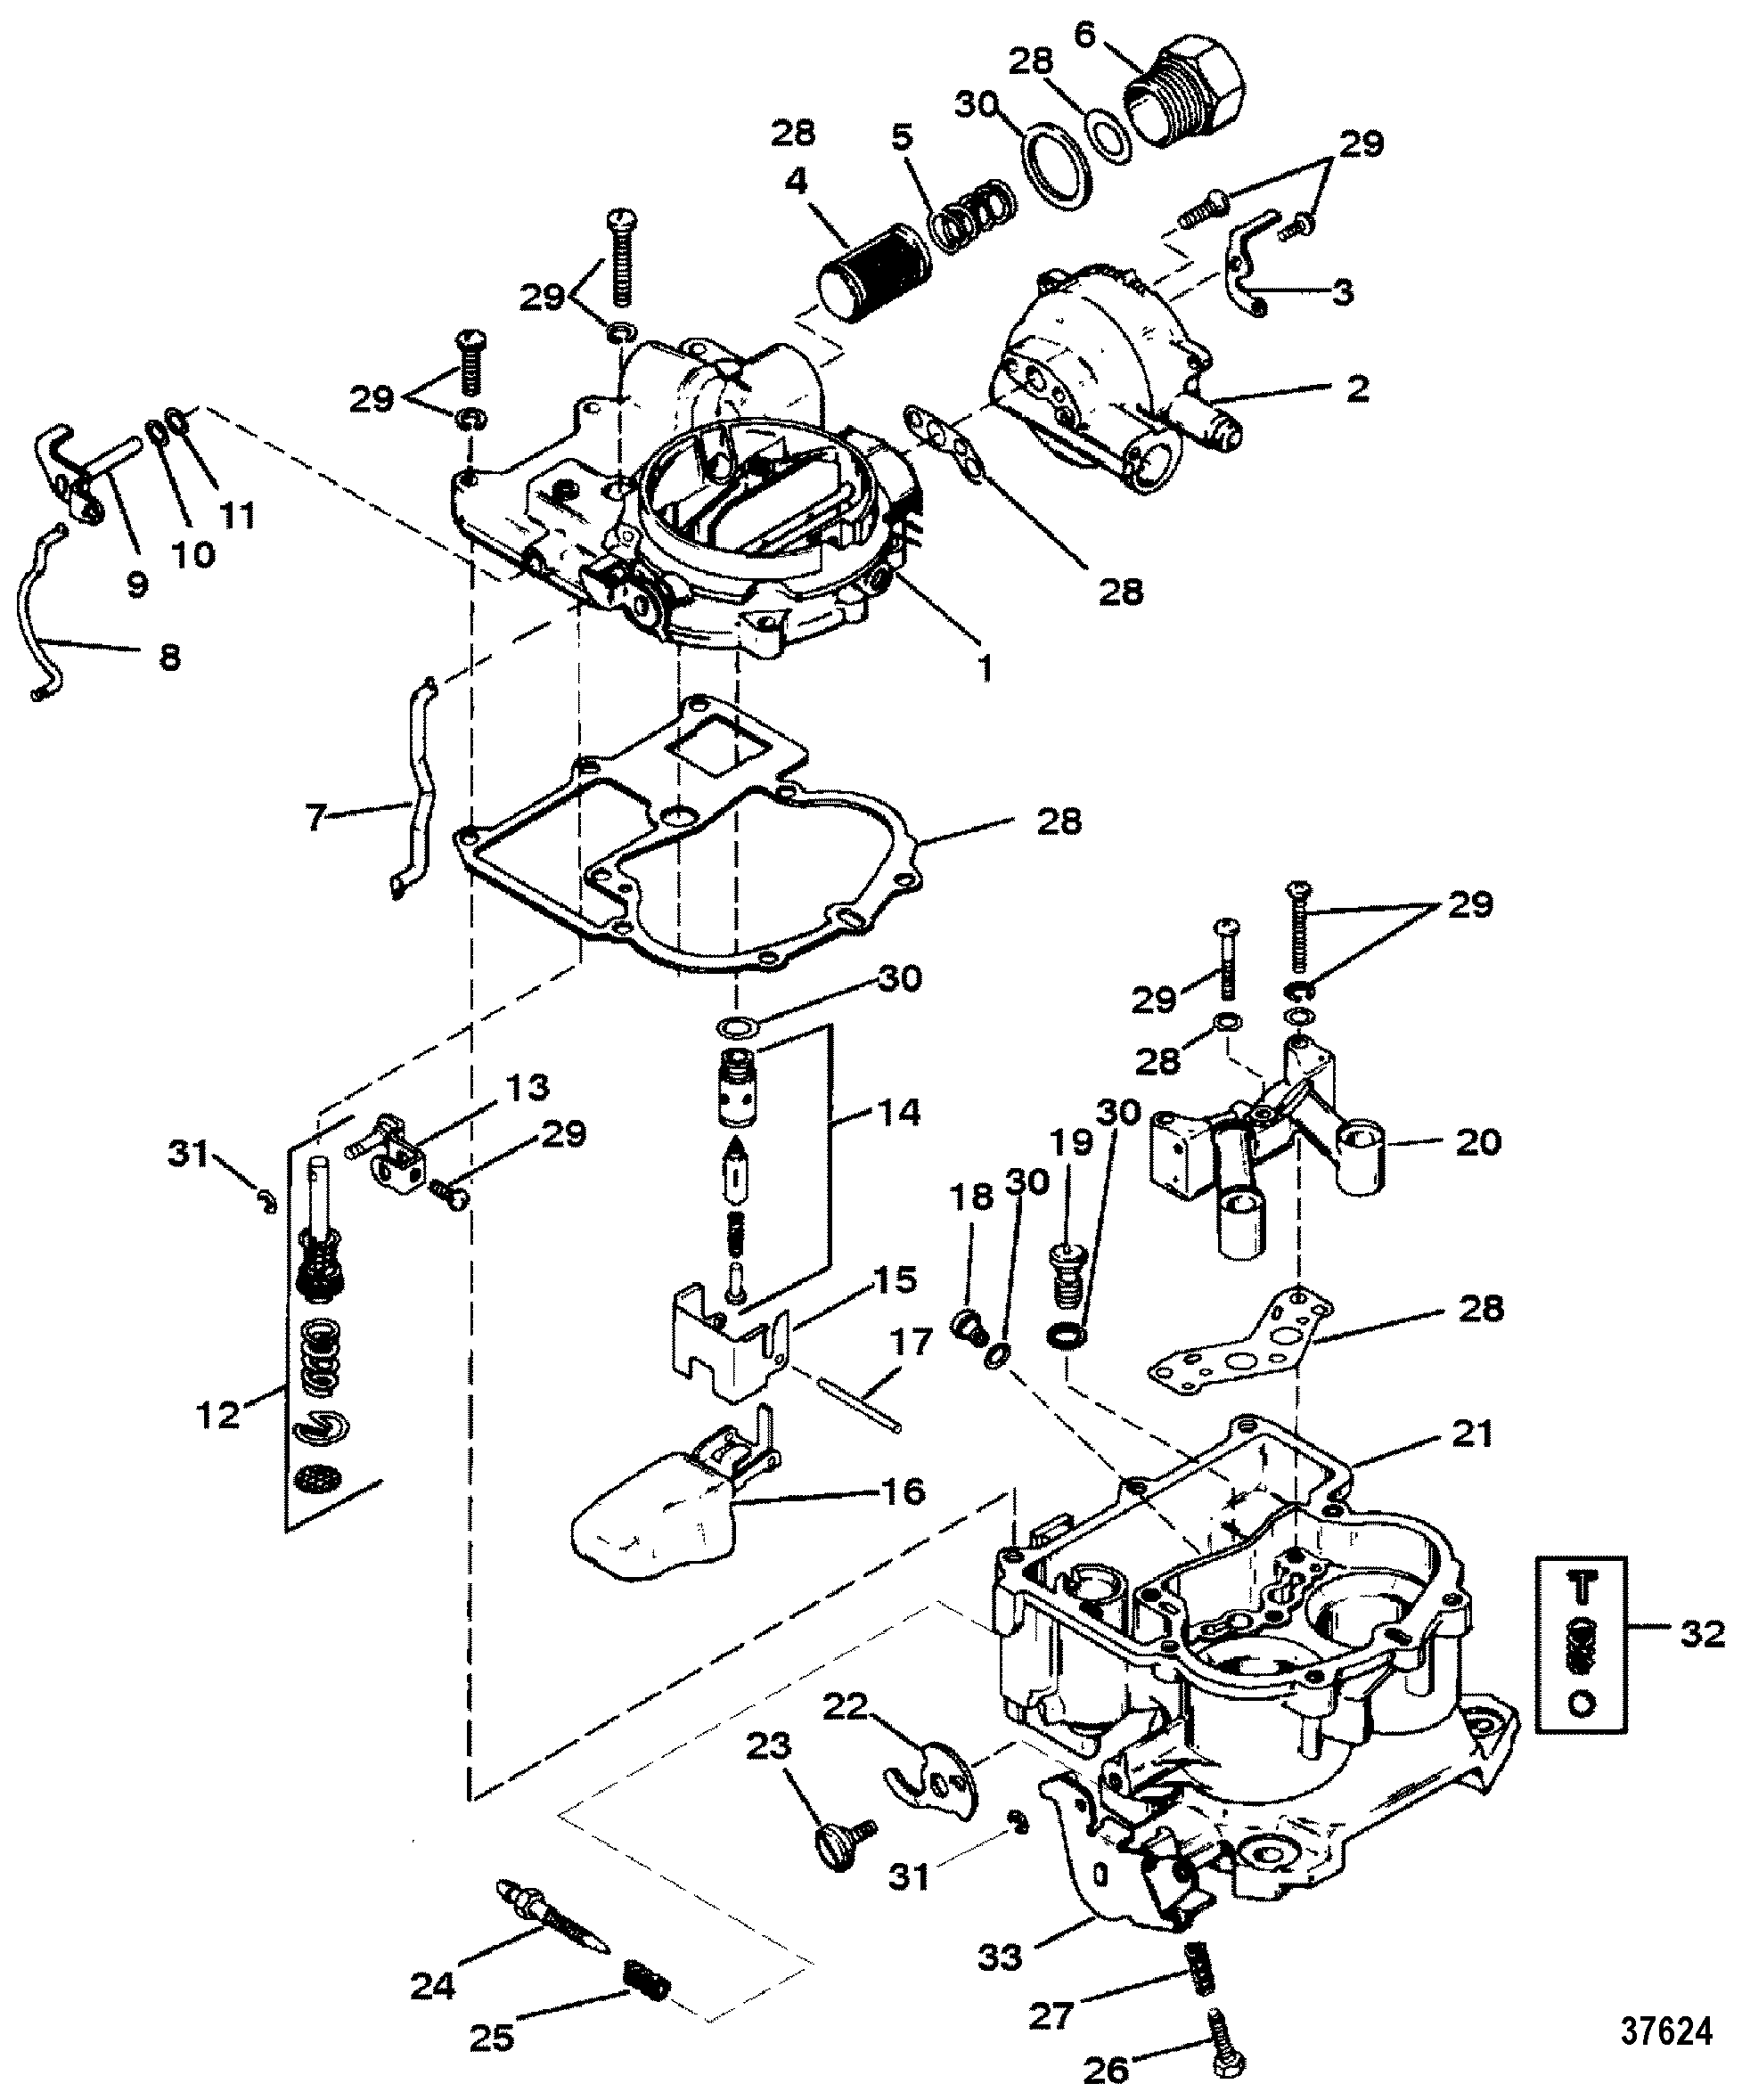 Hardin Marine - Carburetor (Mercarb - 2 Barrel)